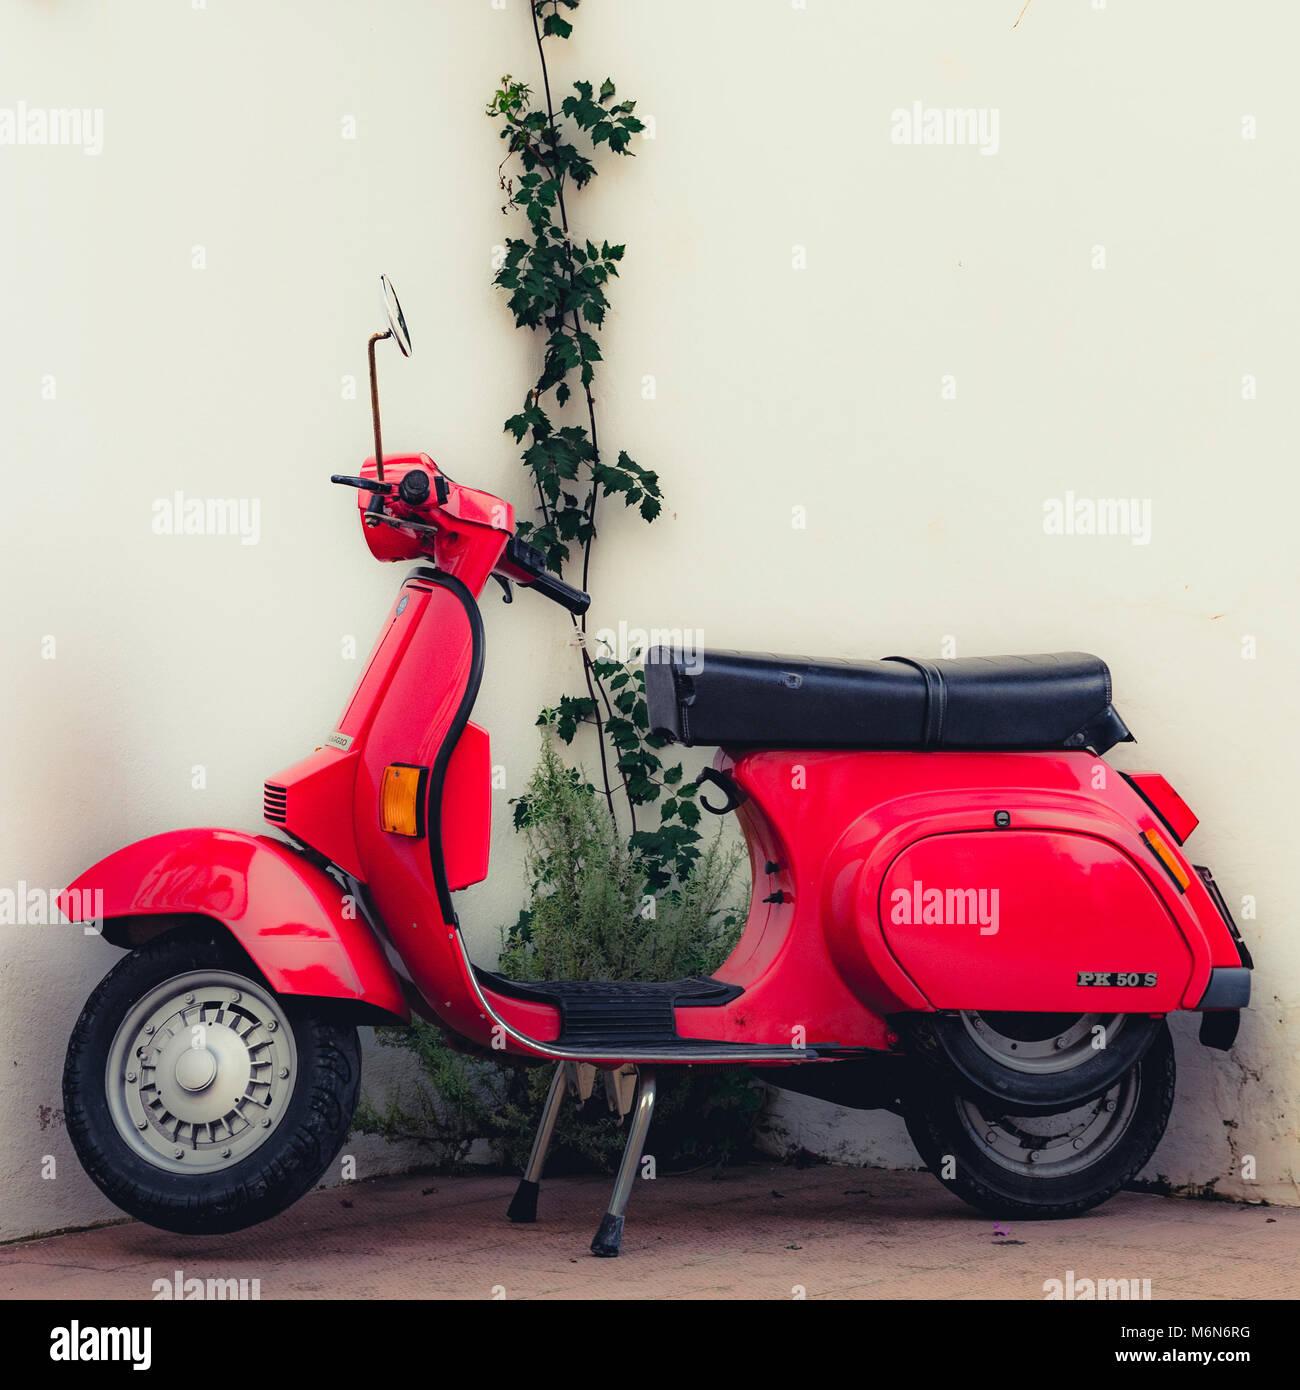 Red Italian Vespa PK 50 S moped - Stock Image